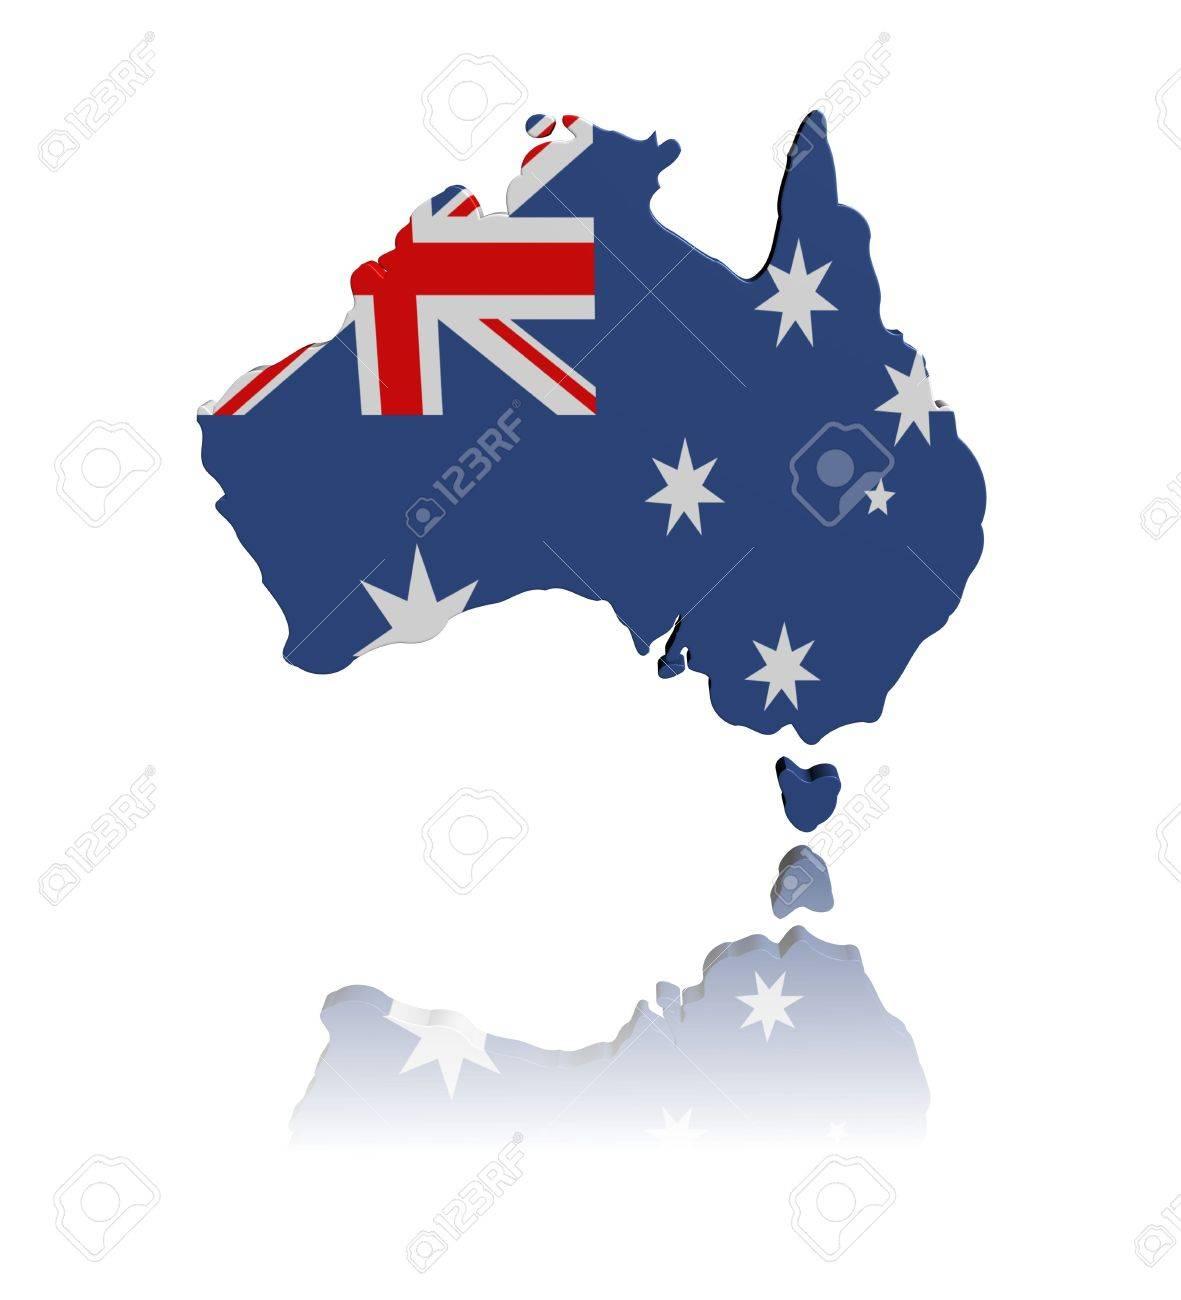 Australia Map And Flag.Stock Illustration